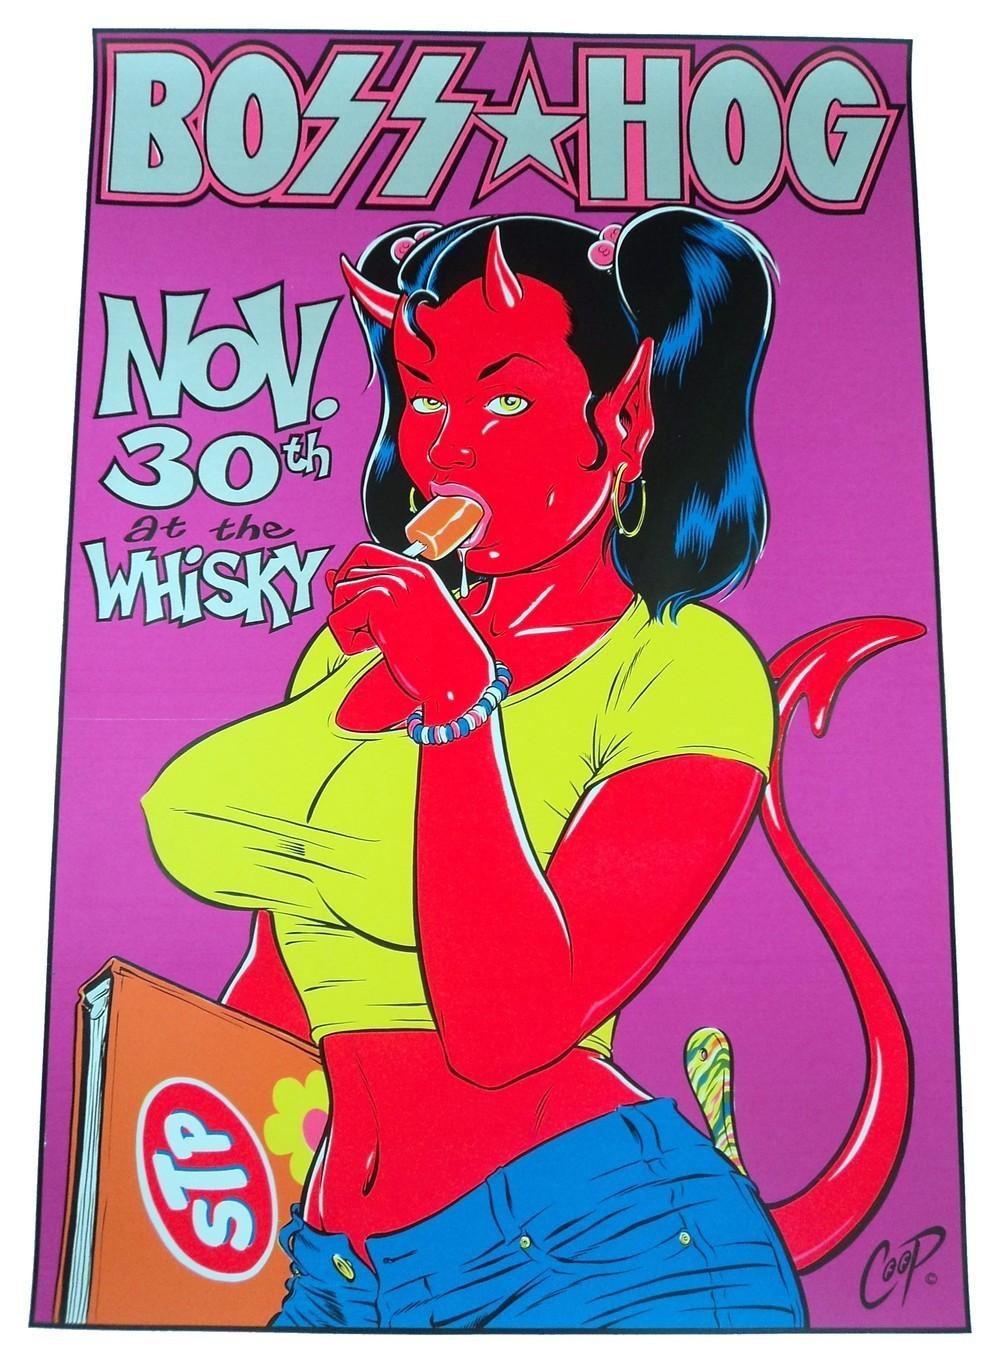 Boss Hog - The Whisky, Los Angeles, CA, US (30 November 1995)